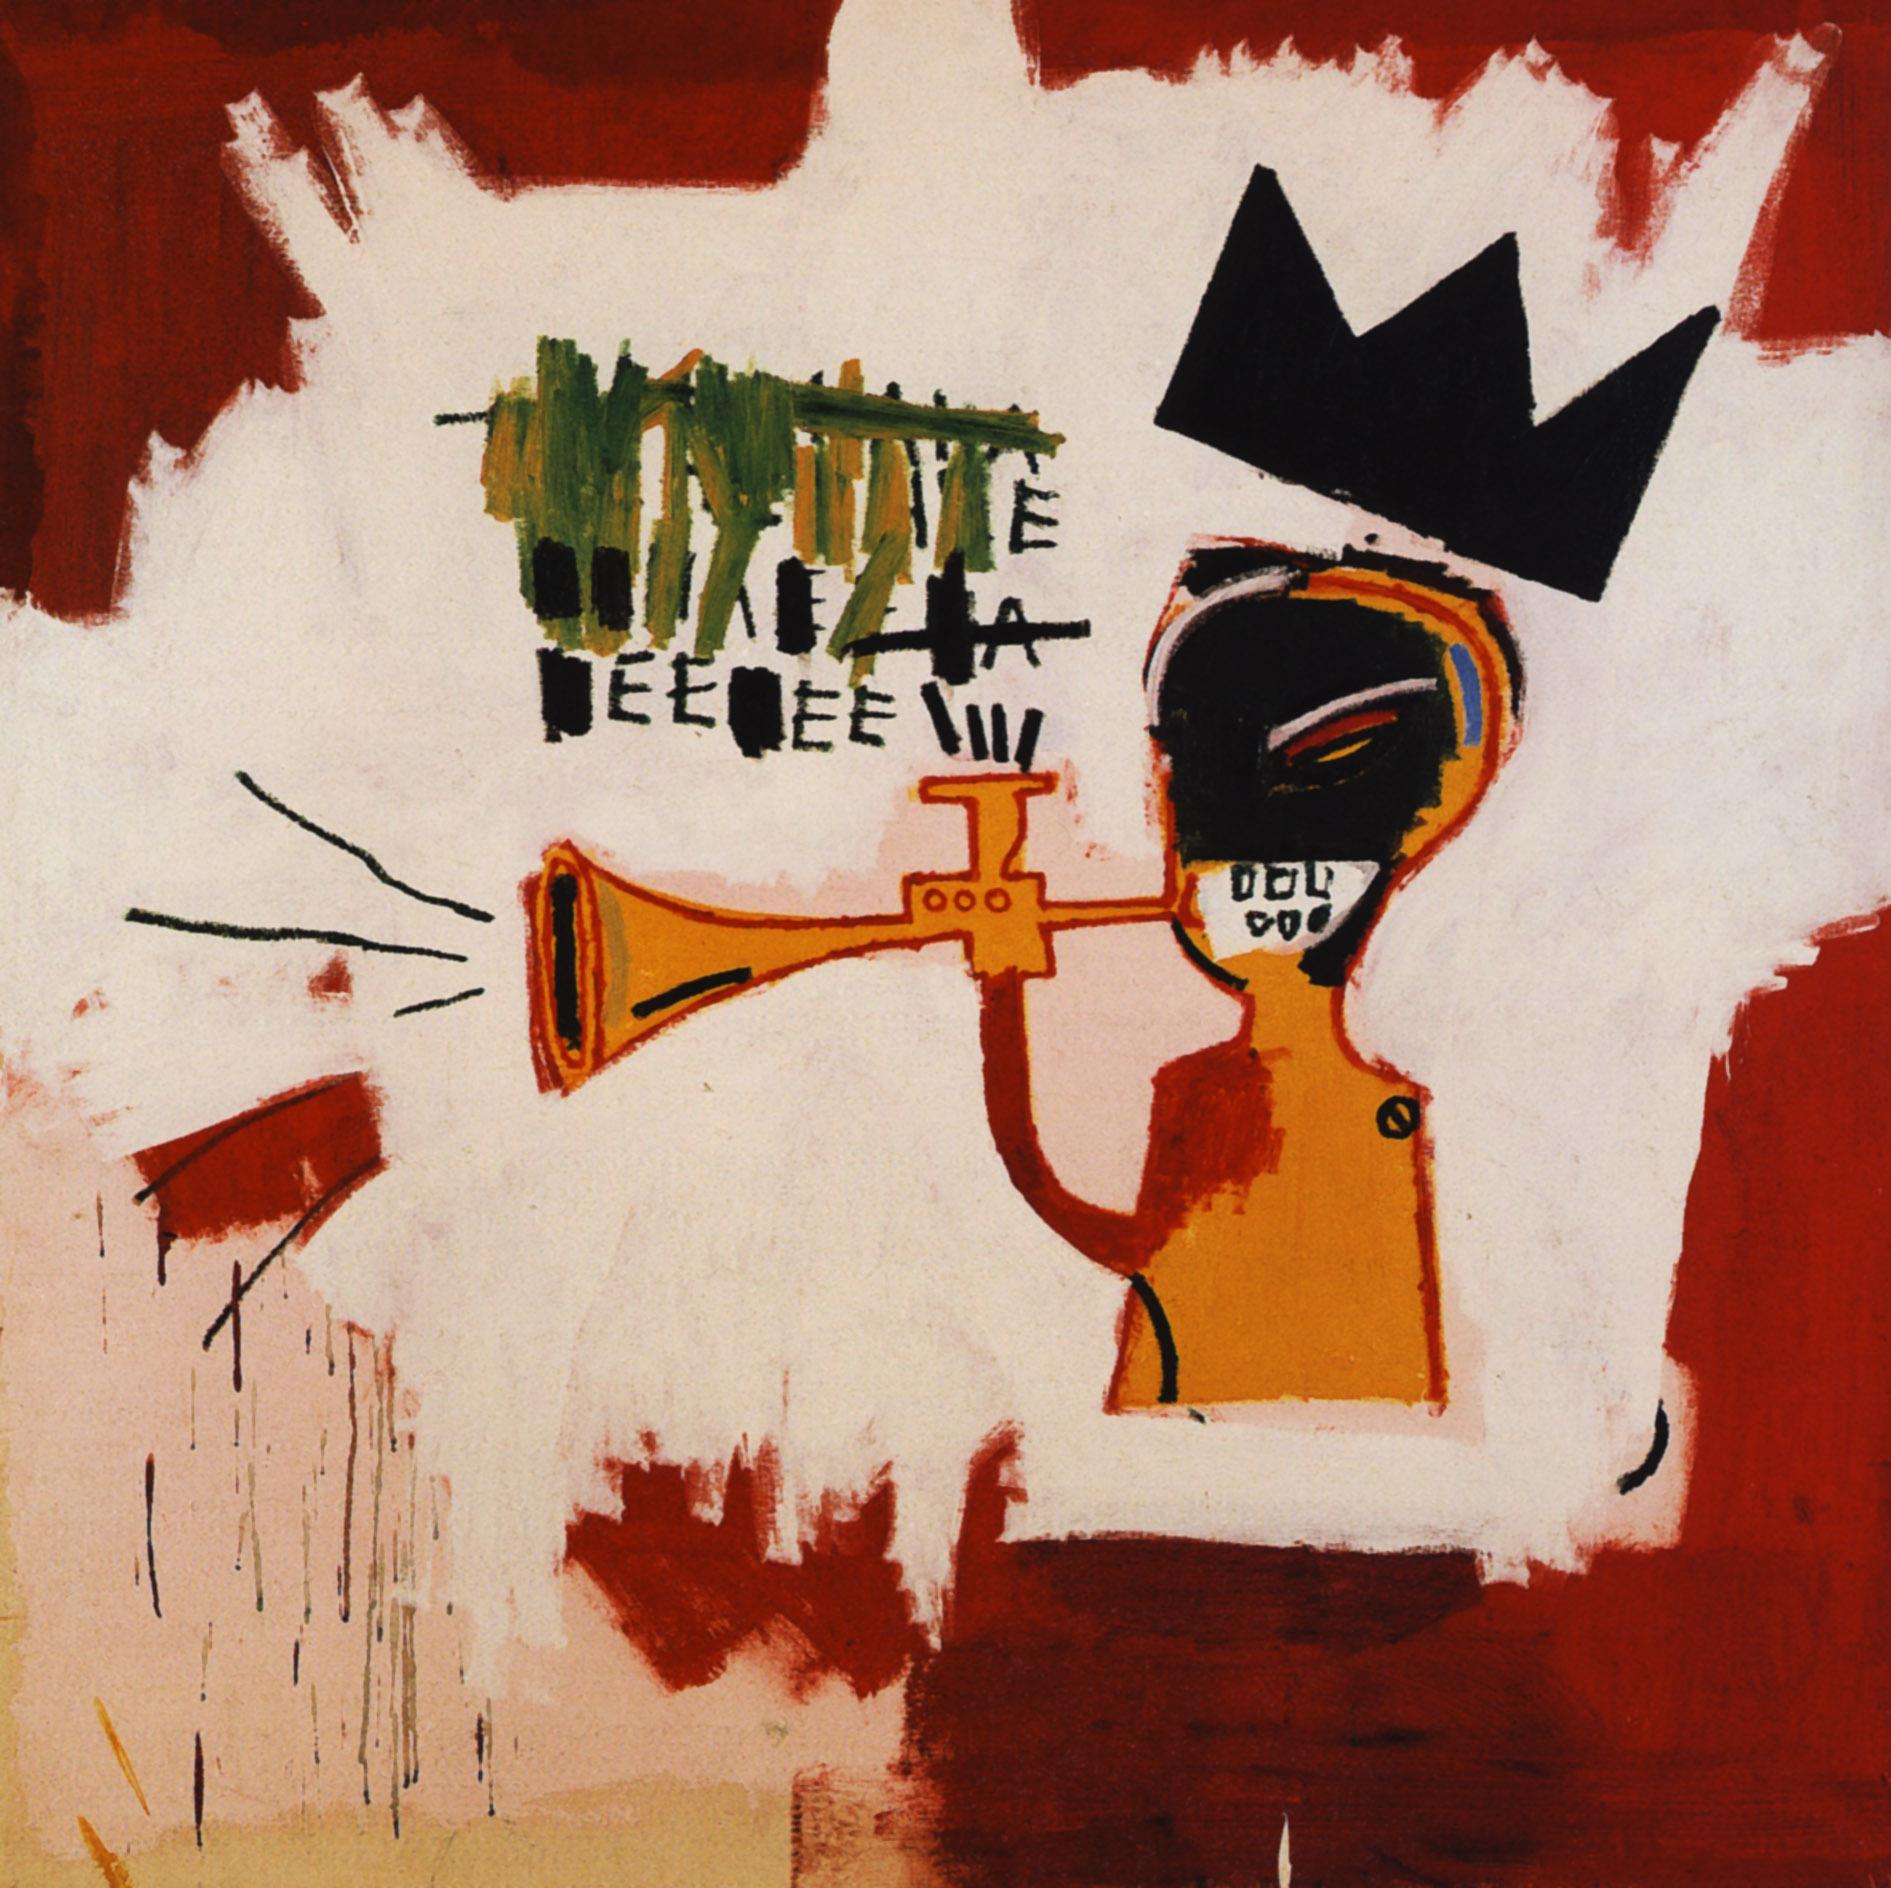 Jean michel basquiat crown painting